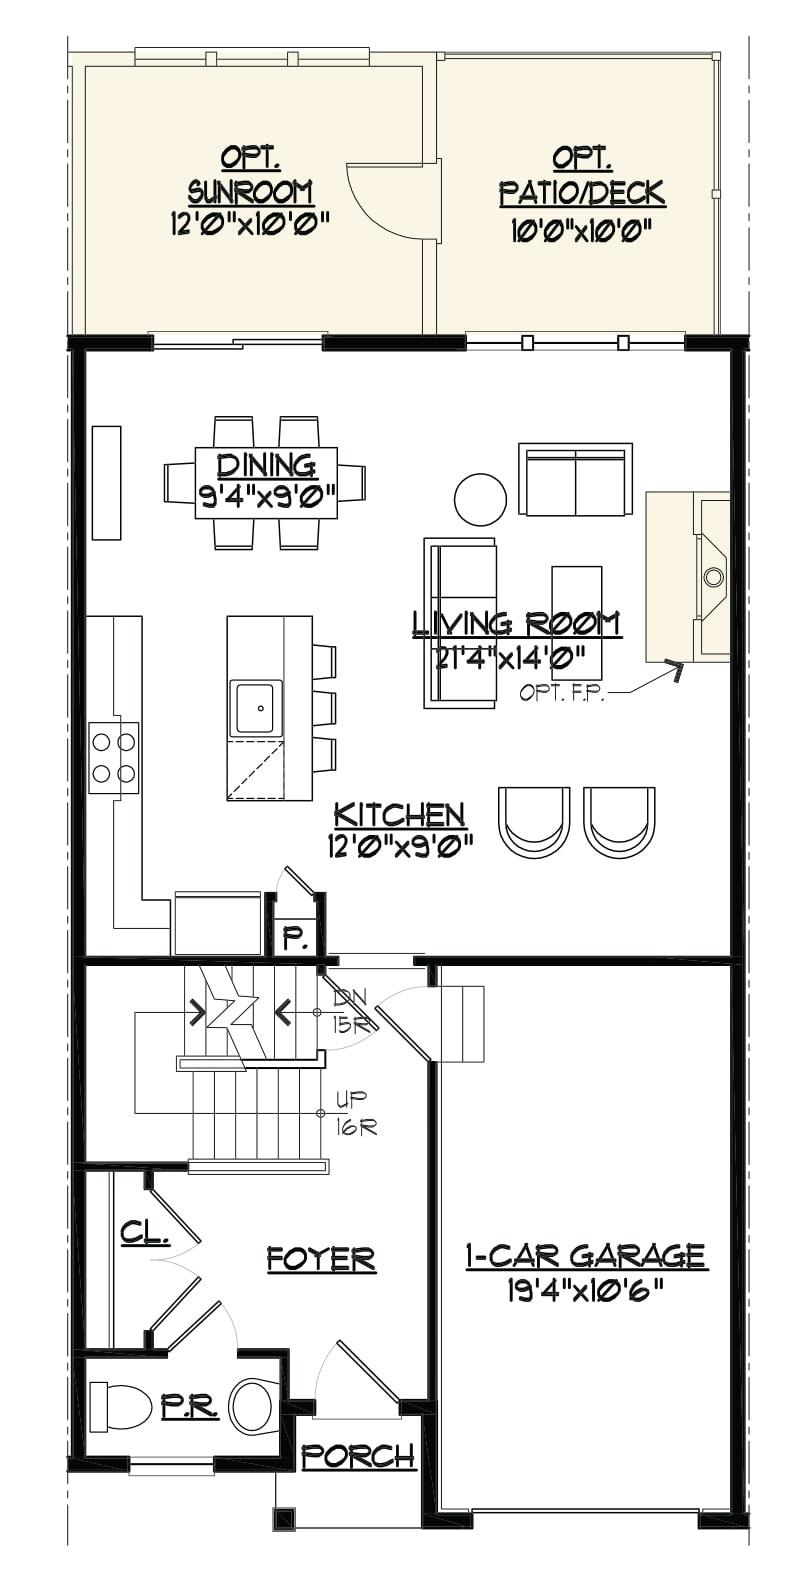 Image of the Jamestown townhome main level floorplan